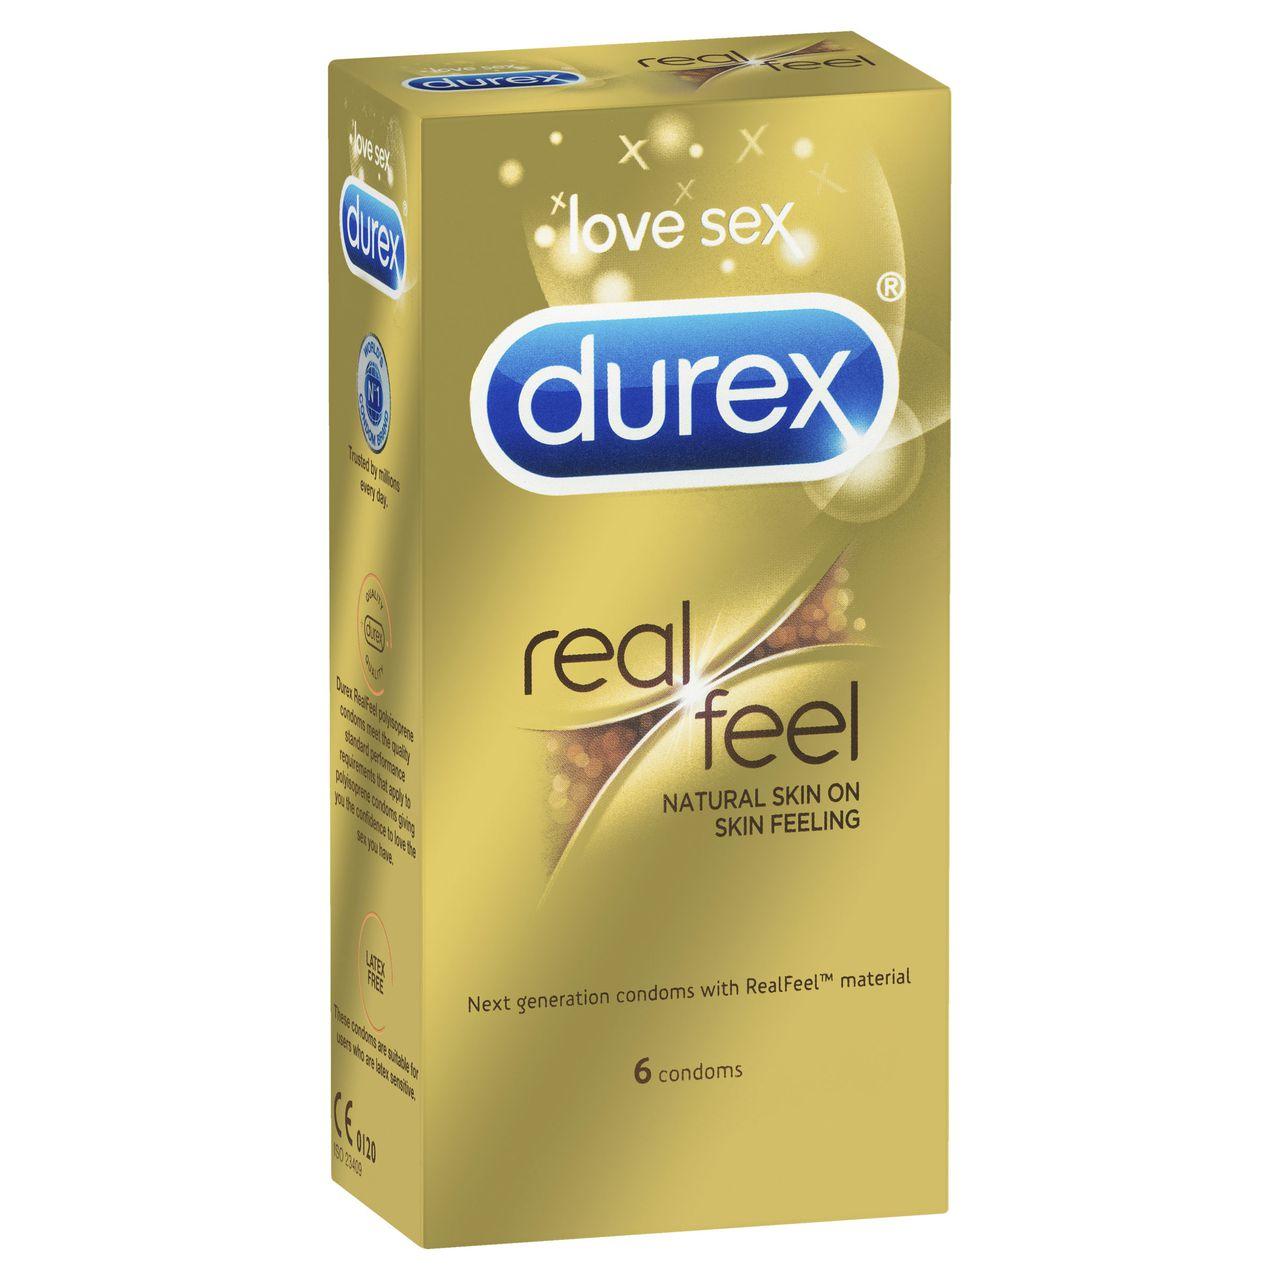 non latex size condoms feel real Durex